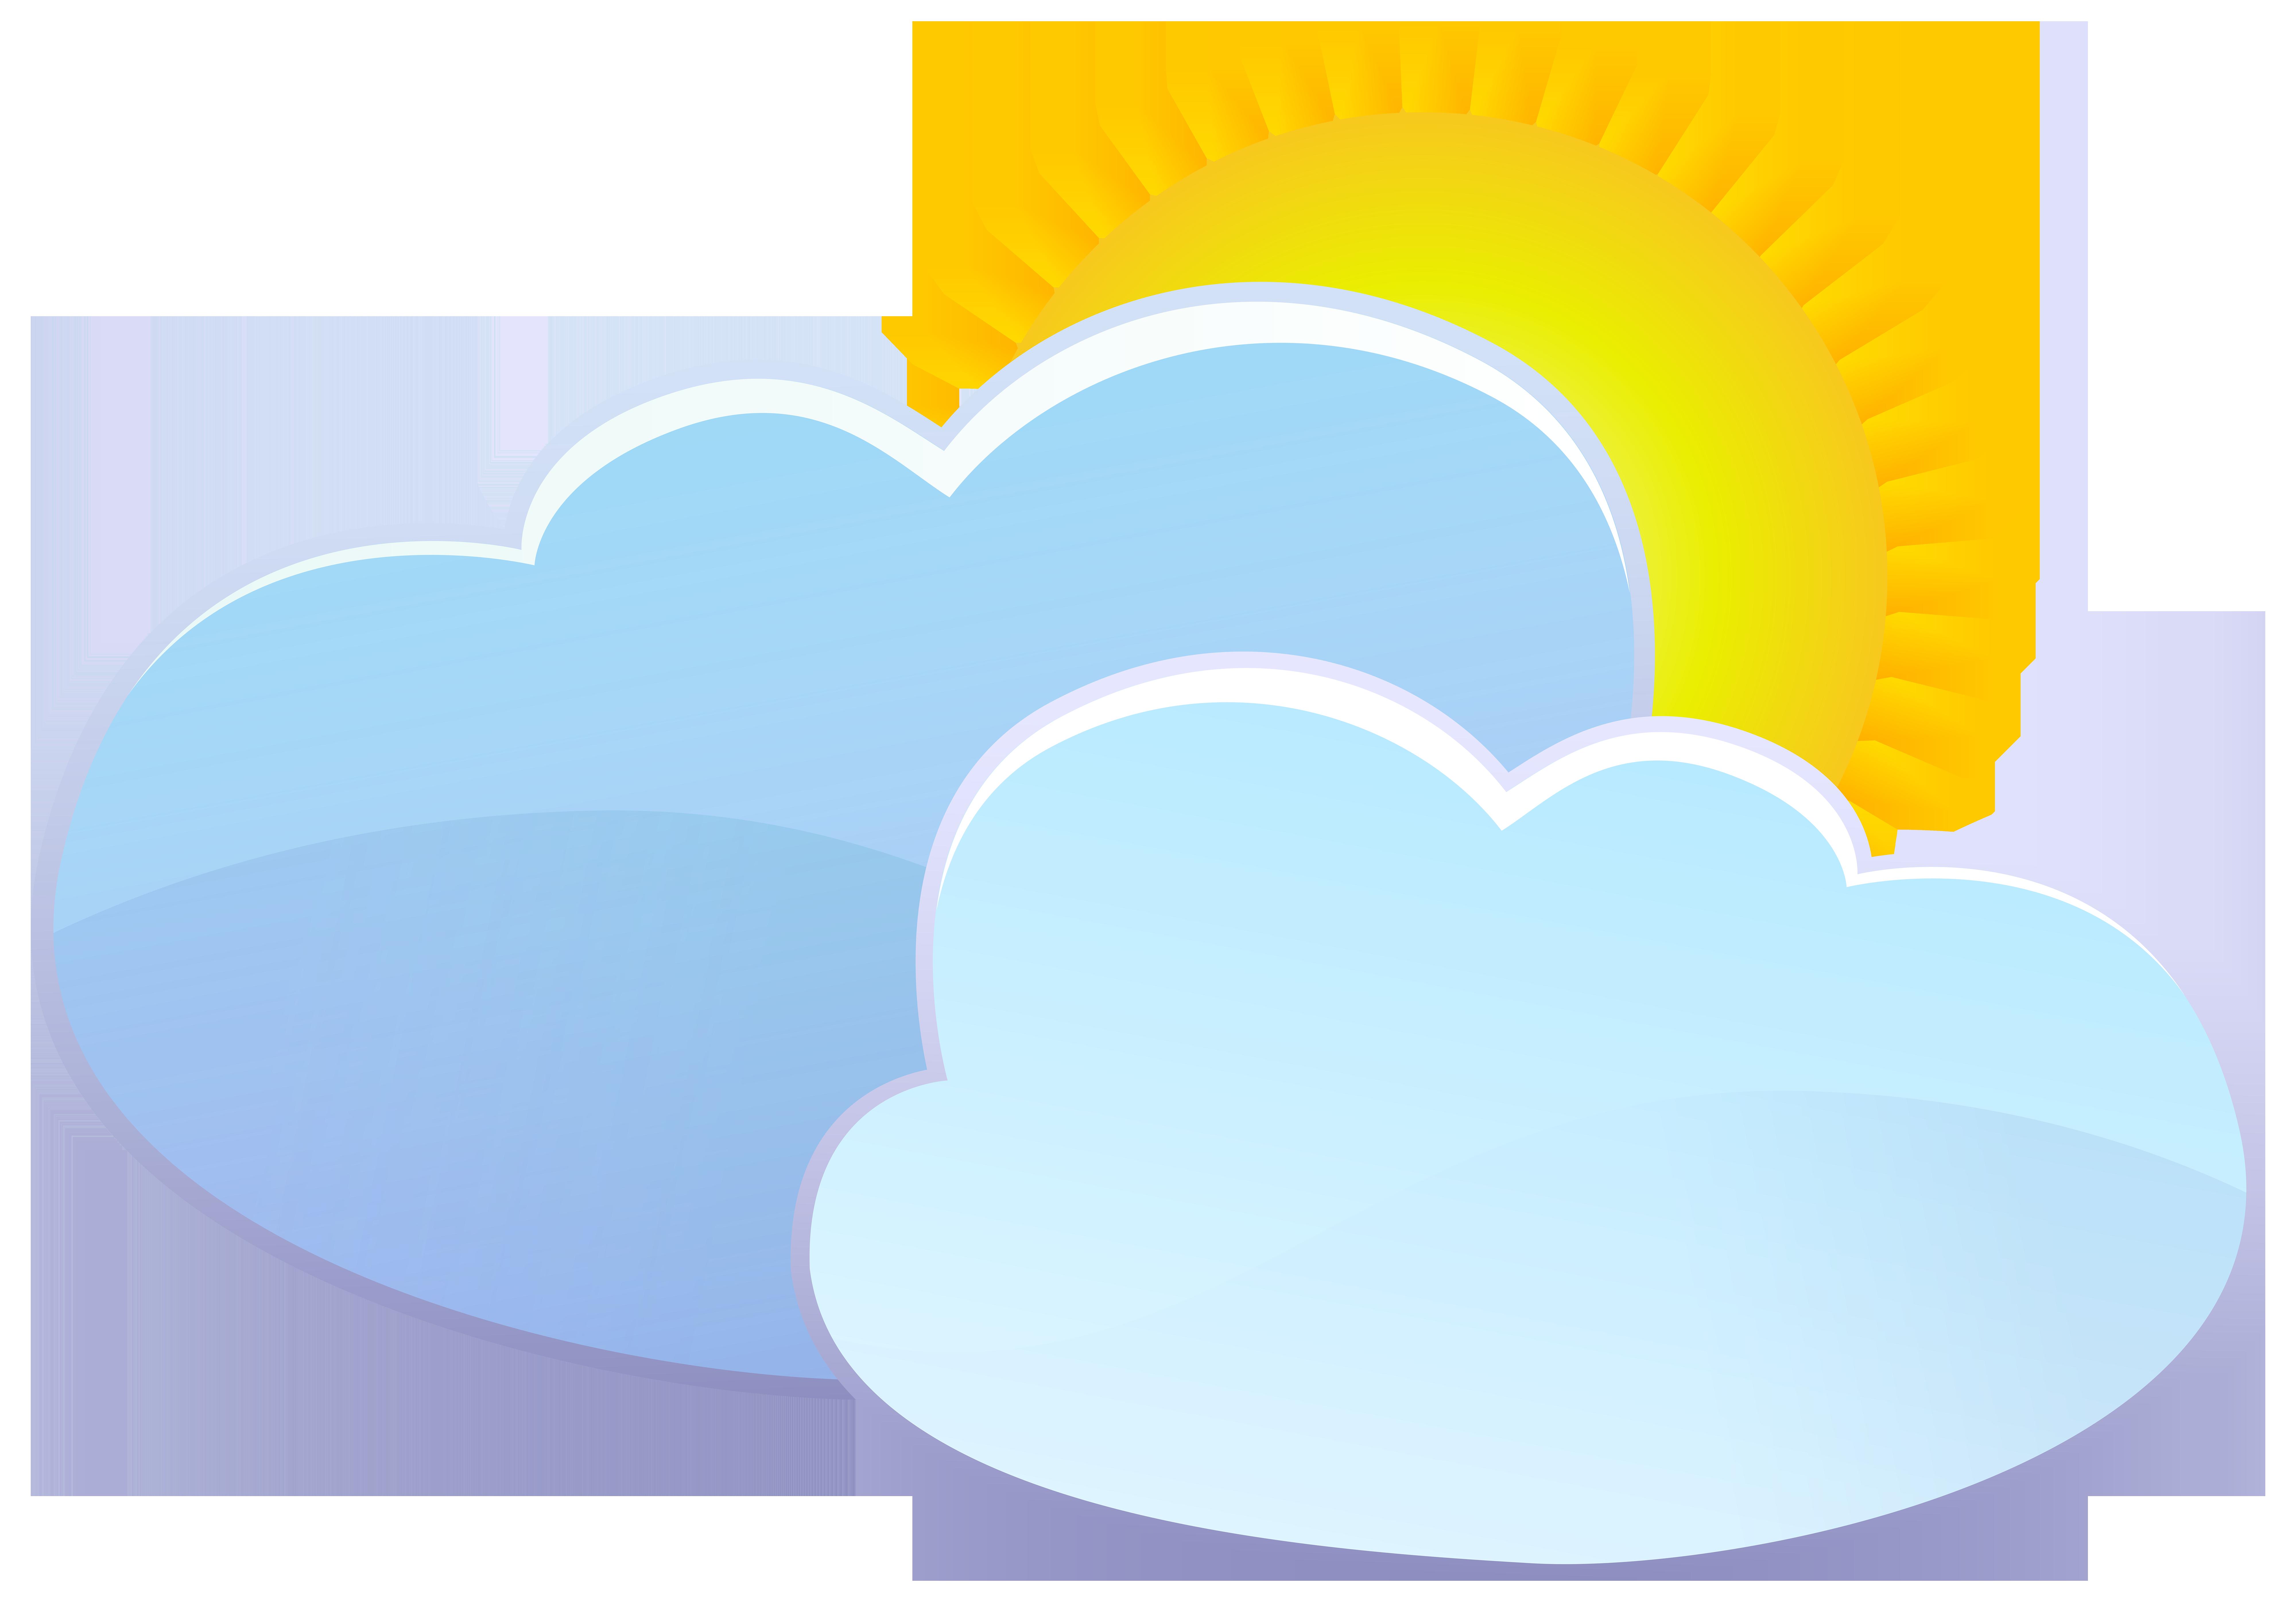 Картинка облако для детей на прозрачном фоне   подборка рисунков (19)